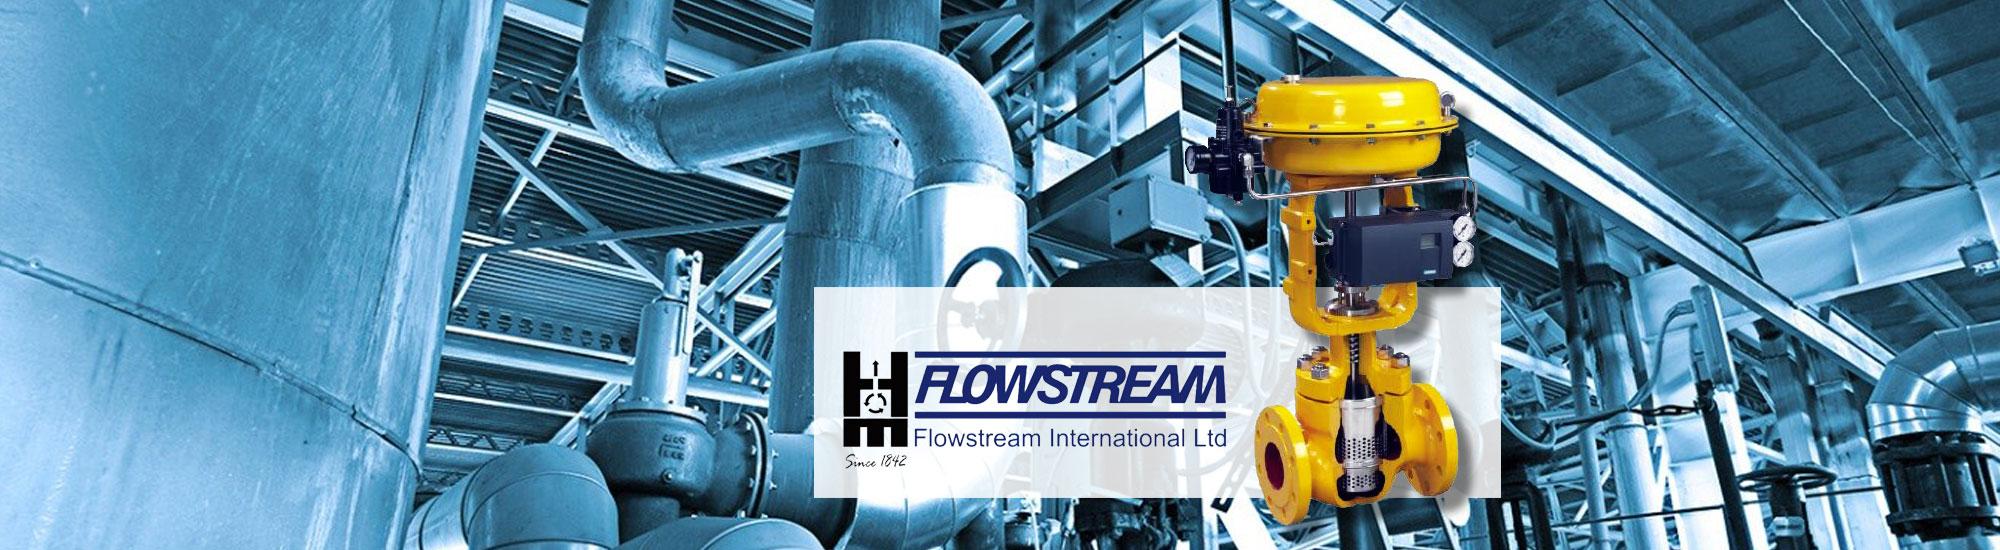 sliderxcaret-flowstream-new